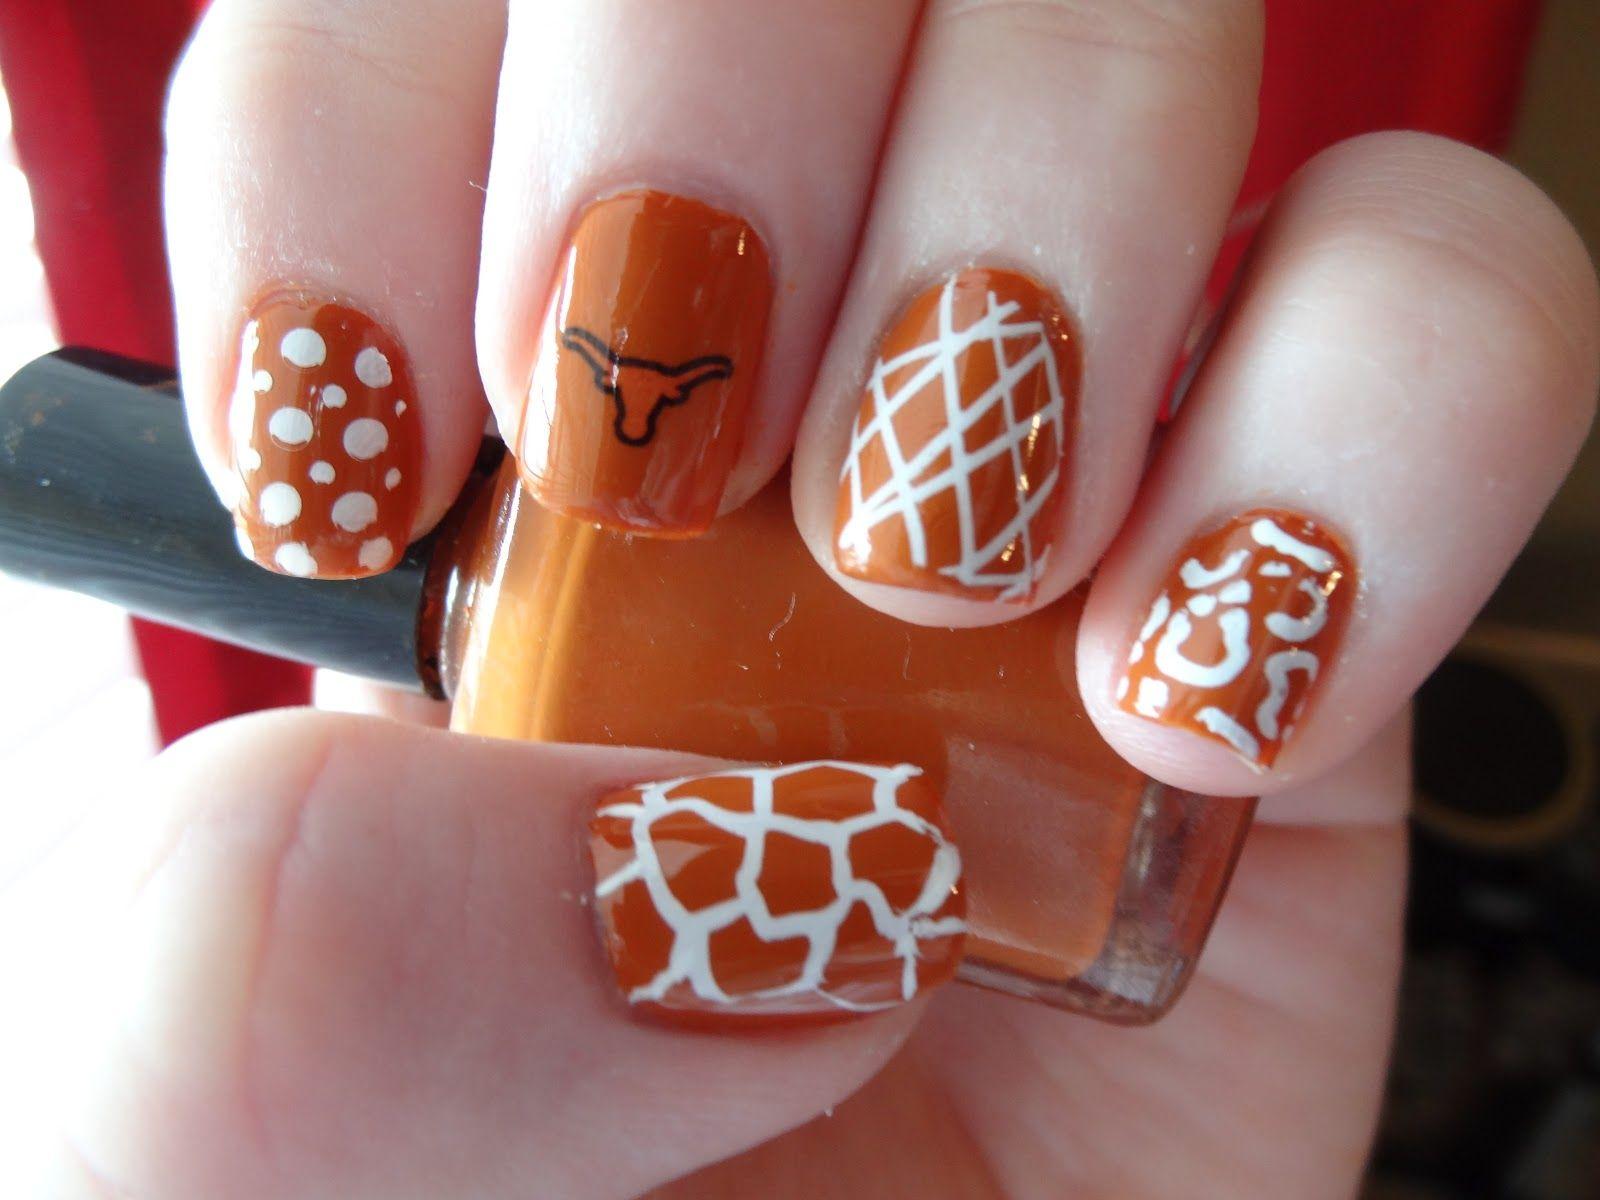 longhorn nail art - Google Search.. so cool doing football team ...